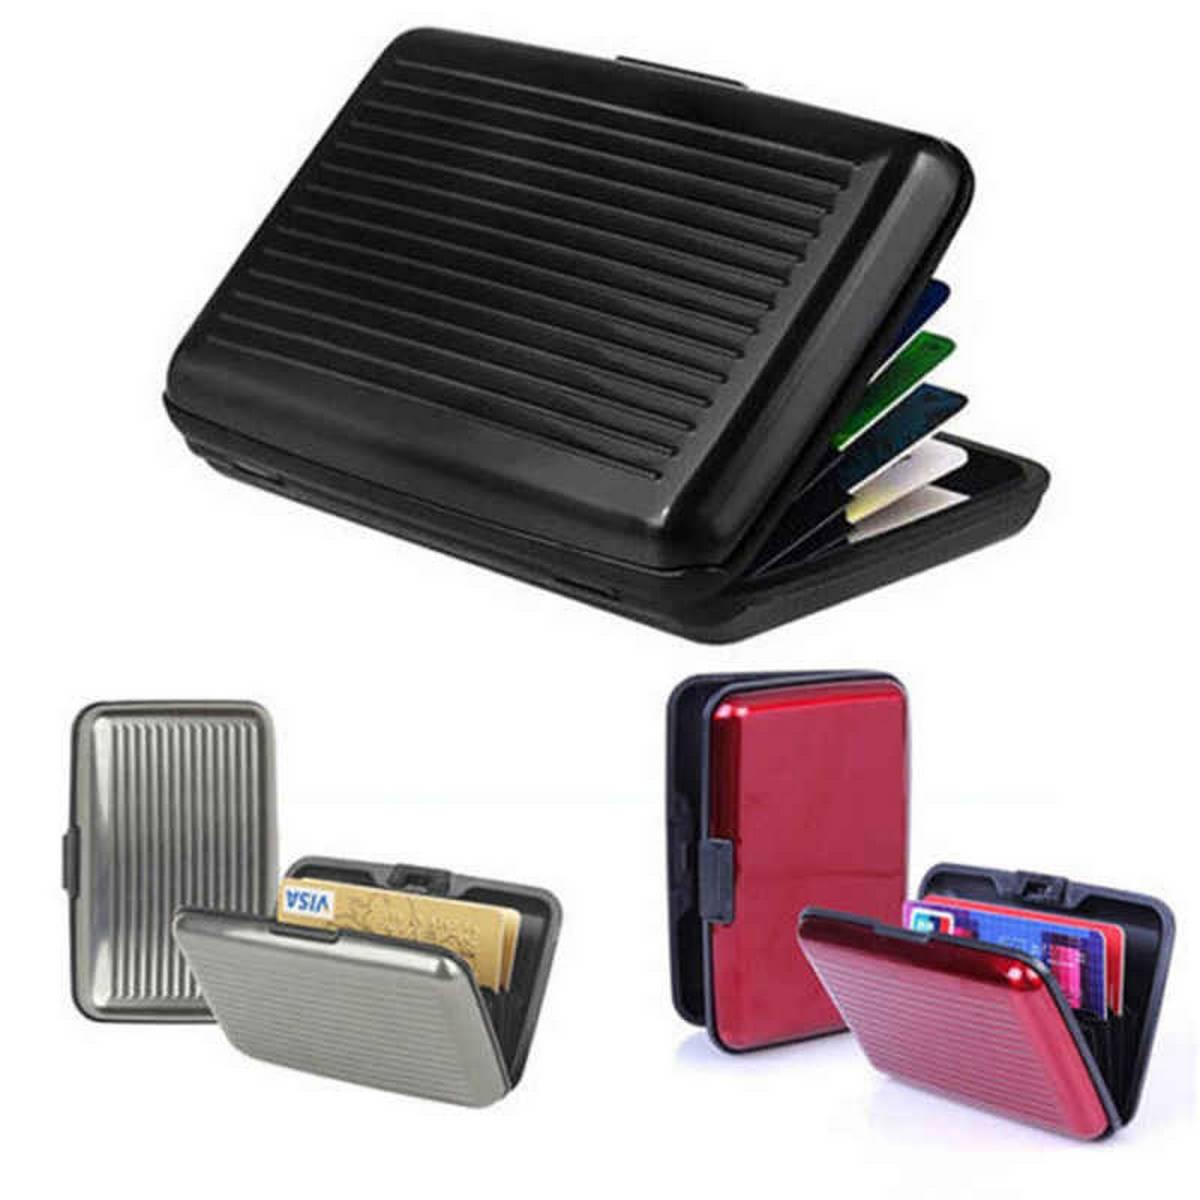 Best Offer  Aluma Wallet Card Holder - Plastic with Tin Coated ak enterprise's